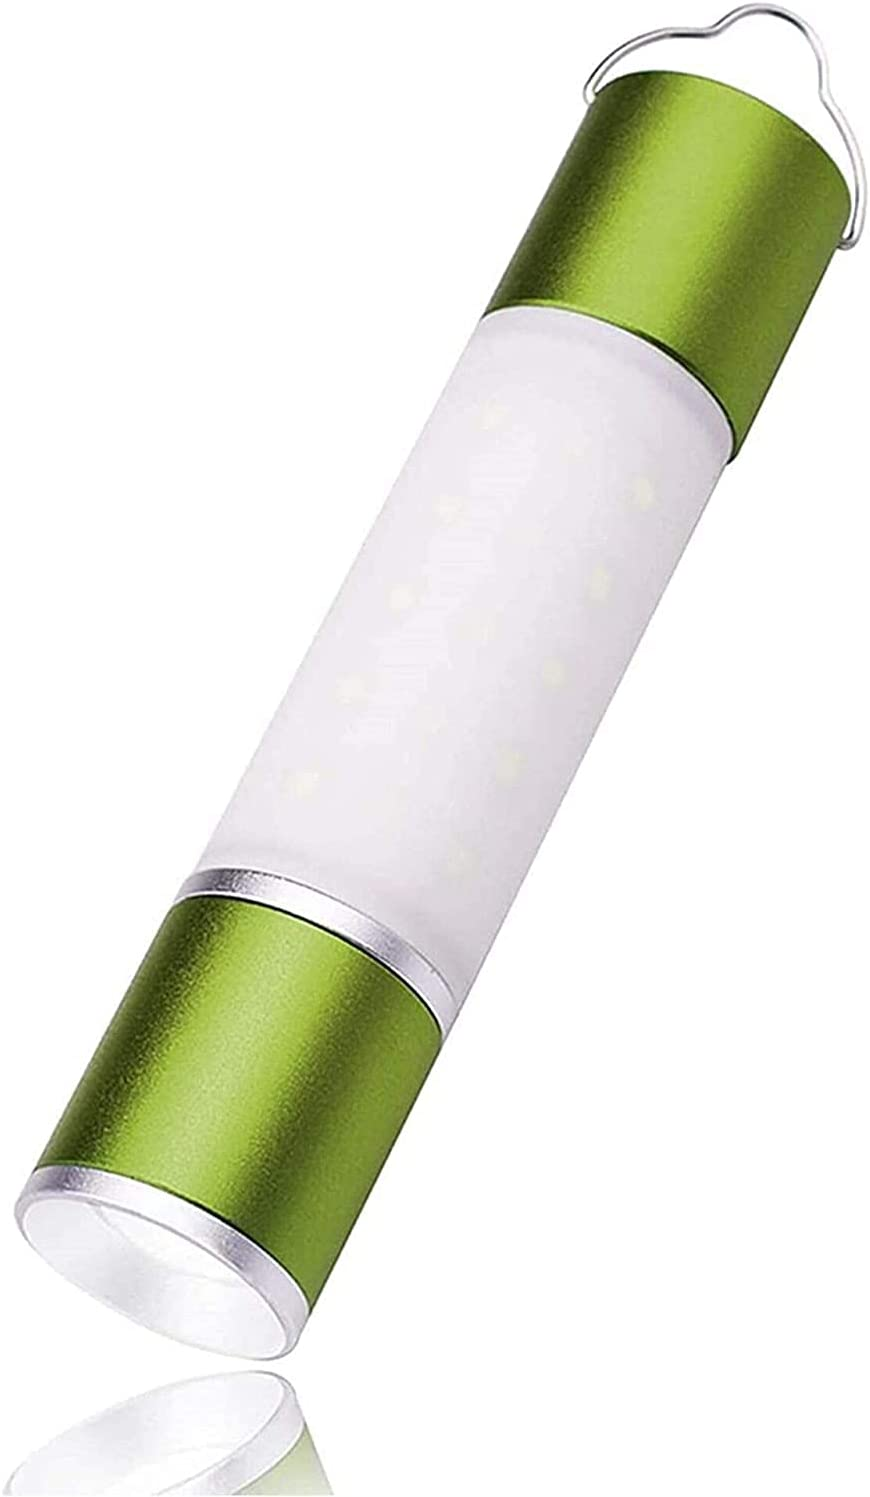 JXE JXO LED Camping Lantern Multifunction Powe USB Oakland Mall Popular product Rechargeable